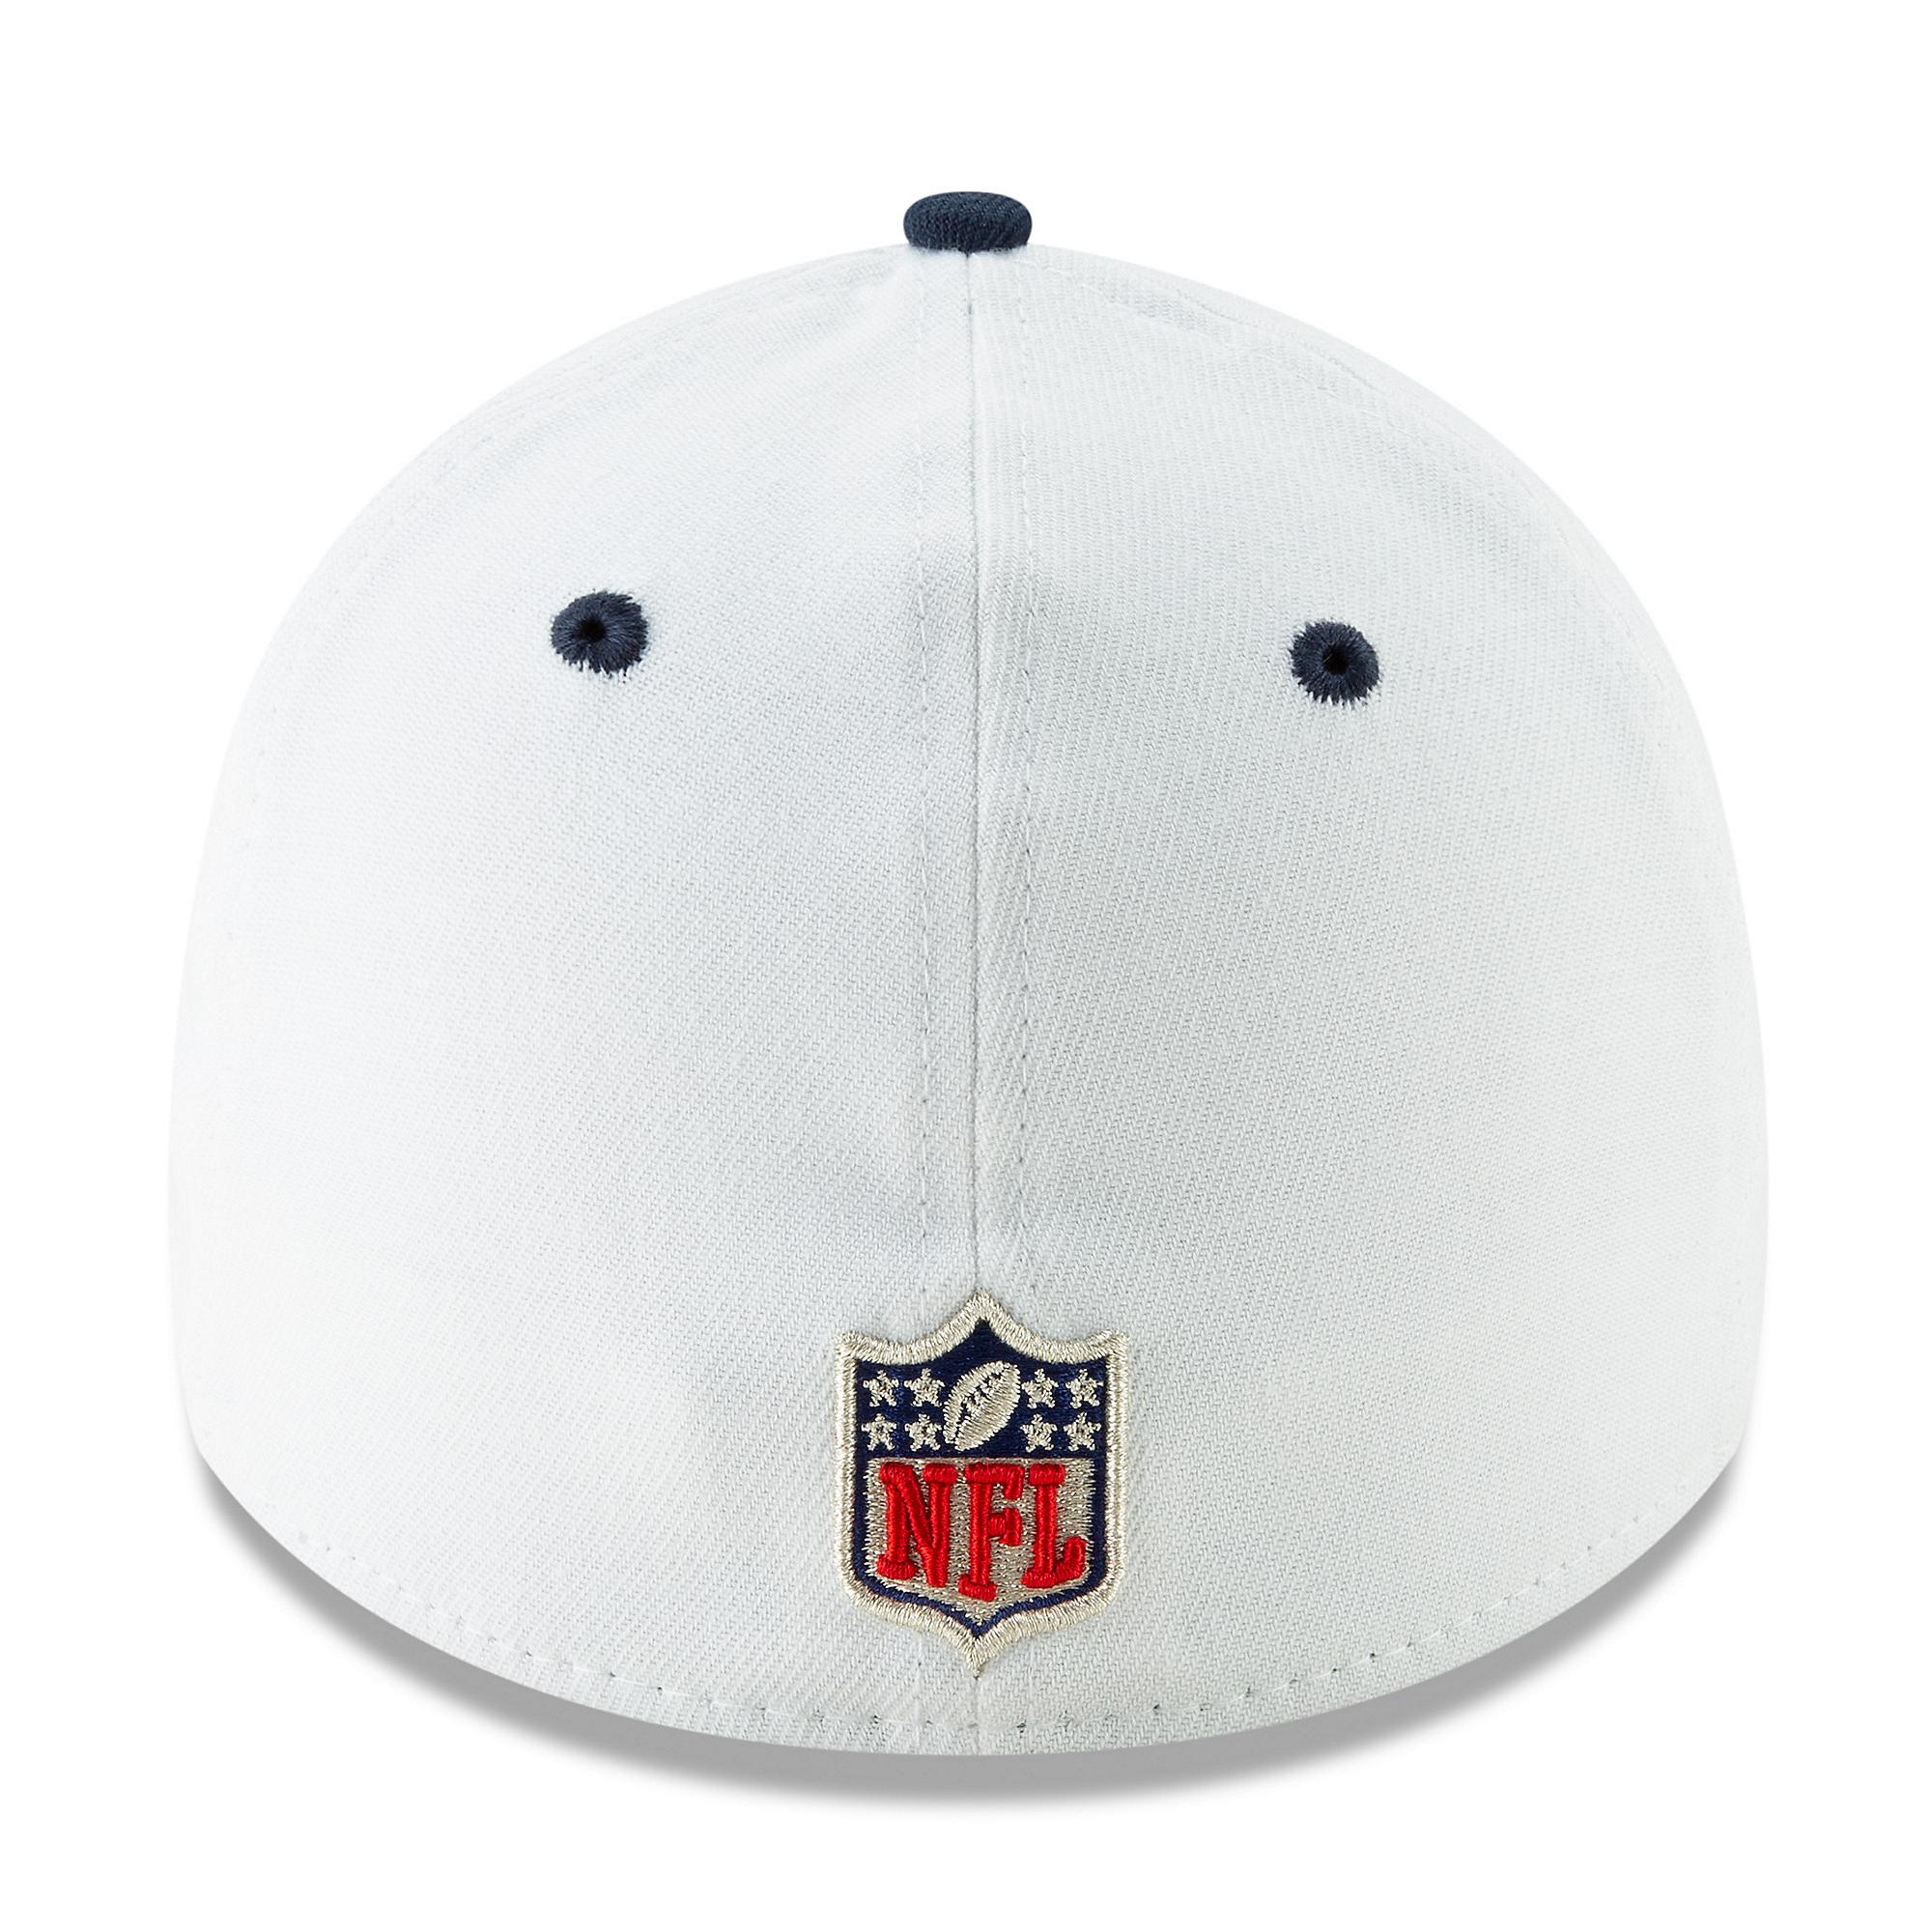 Dallas Cowboys New Era Thanksgiving 39Thirty Cap ... 6ebebf1f3